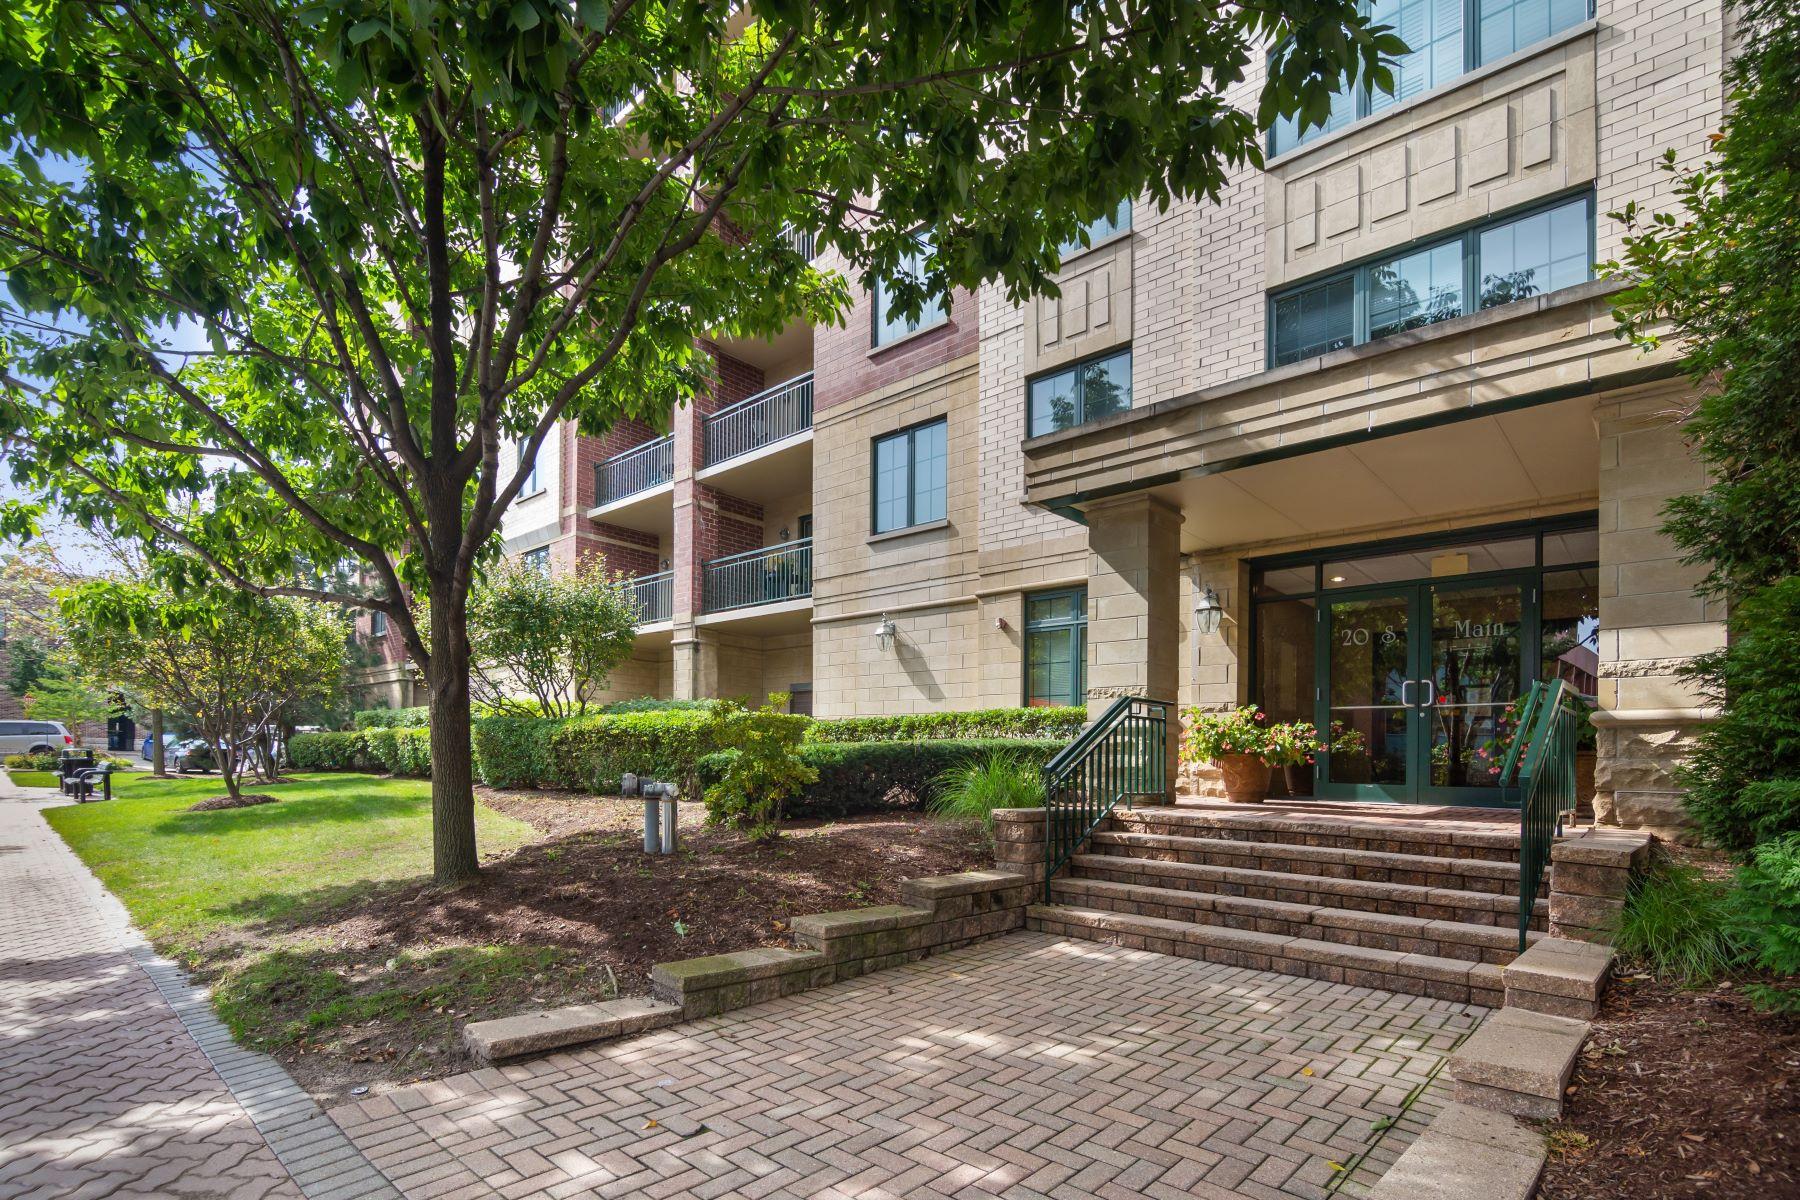 Condominiums para Venda às Bright and Spacious Condo 20 S Main Street Unit 303, Mount Prospect, Illinois 60056 Estados Unidos